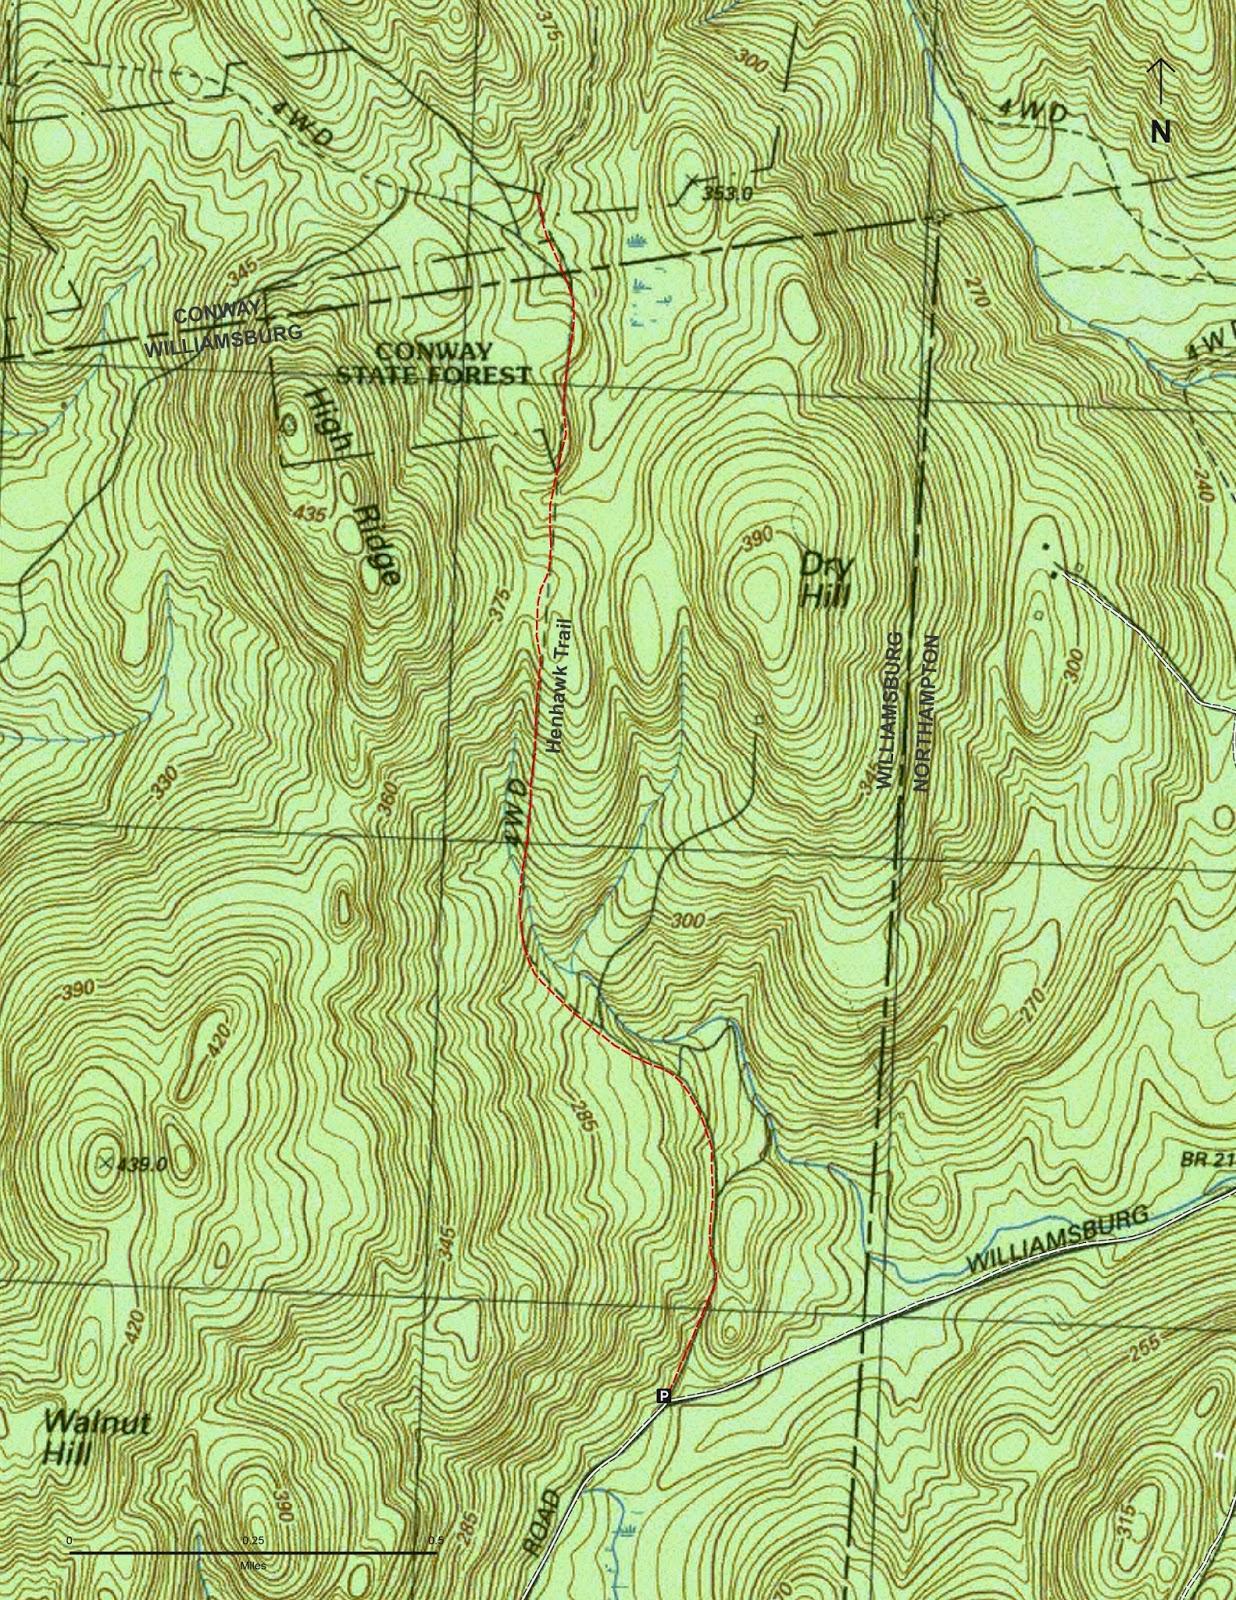 Henhawk Trail map